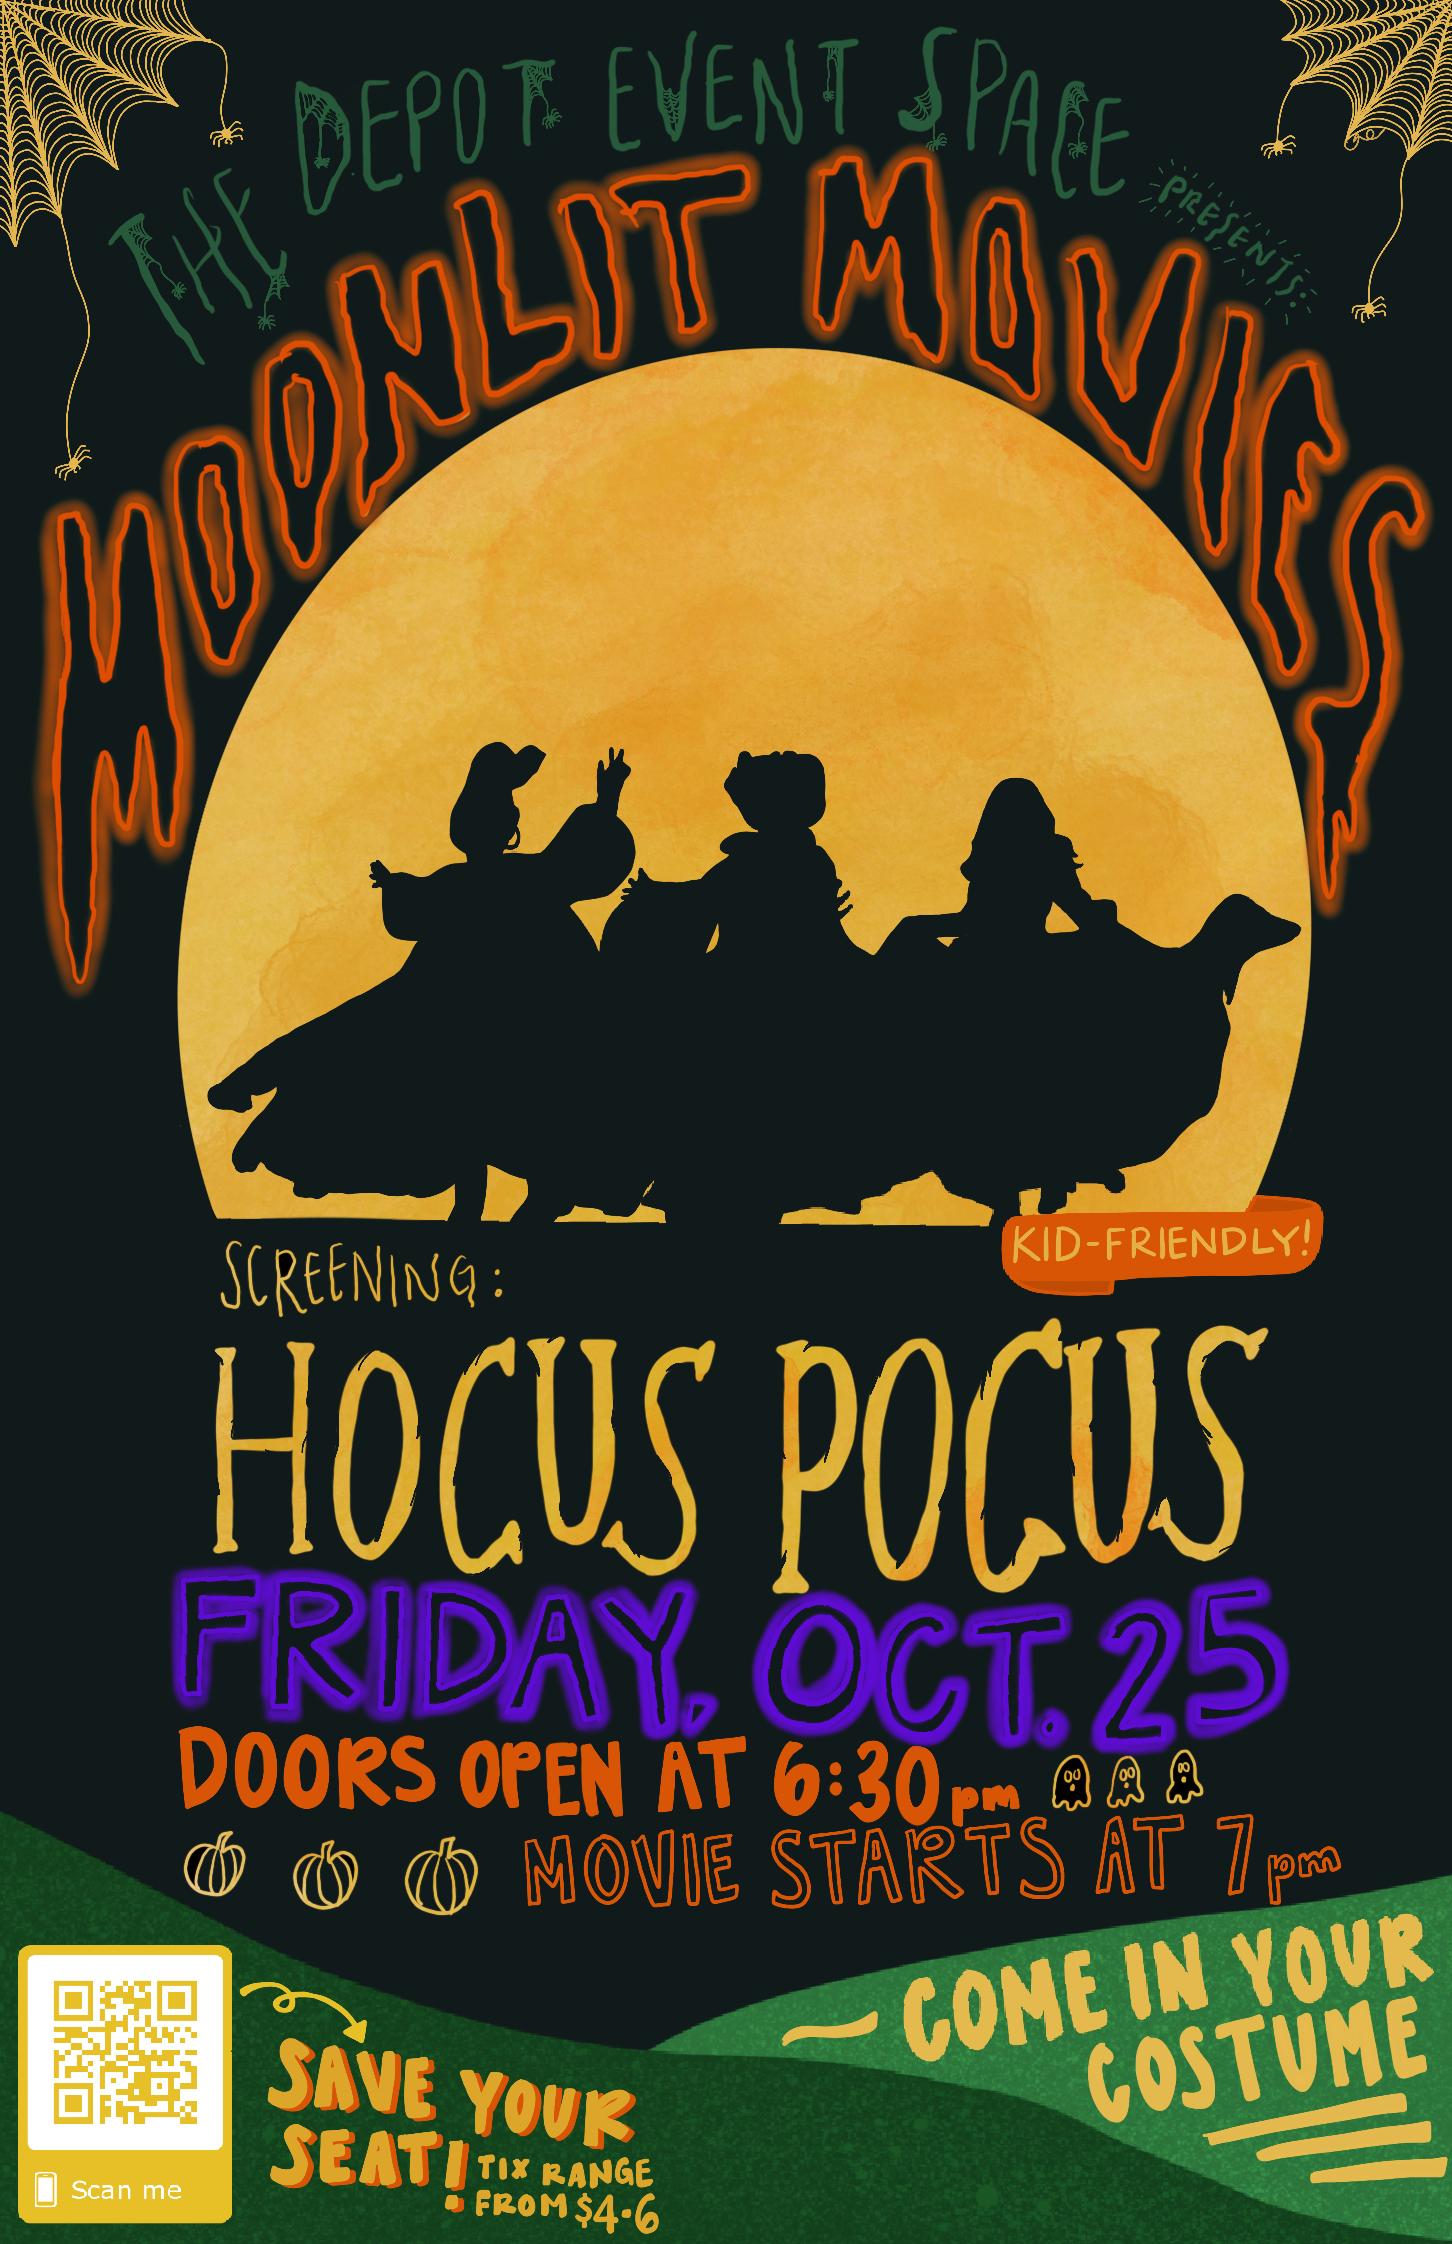 Moonlit Movies - Hocus Pocus.png